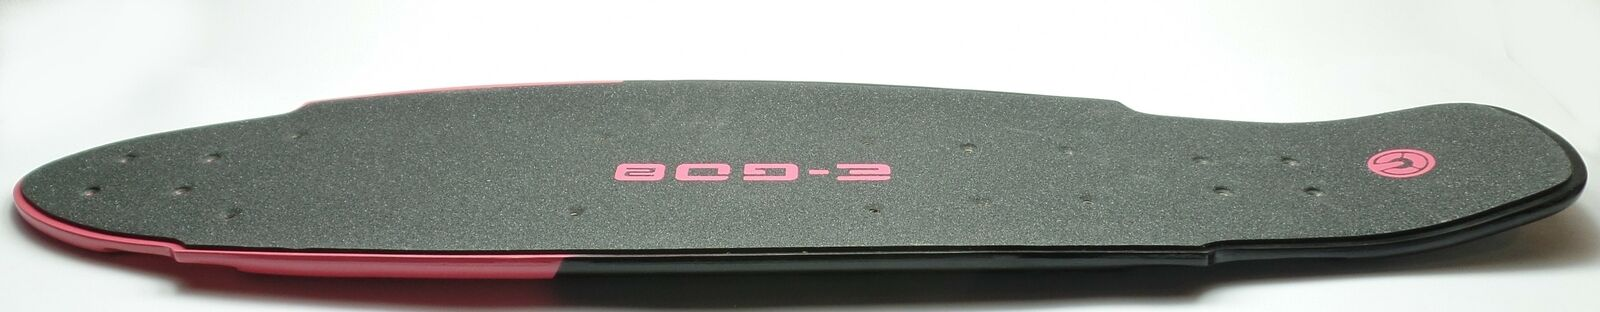 Yuneec E-GO 2 Spare Part EGOCR016  Bord with Grip Tape YEG®  molto popolare